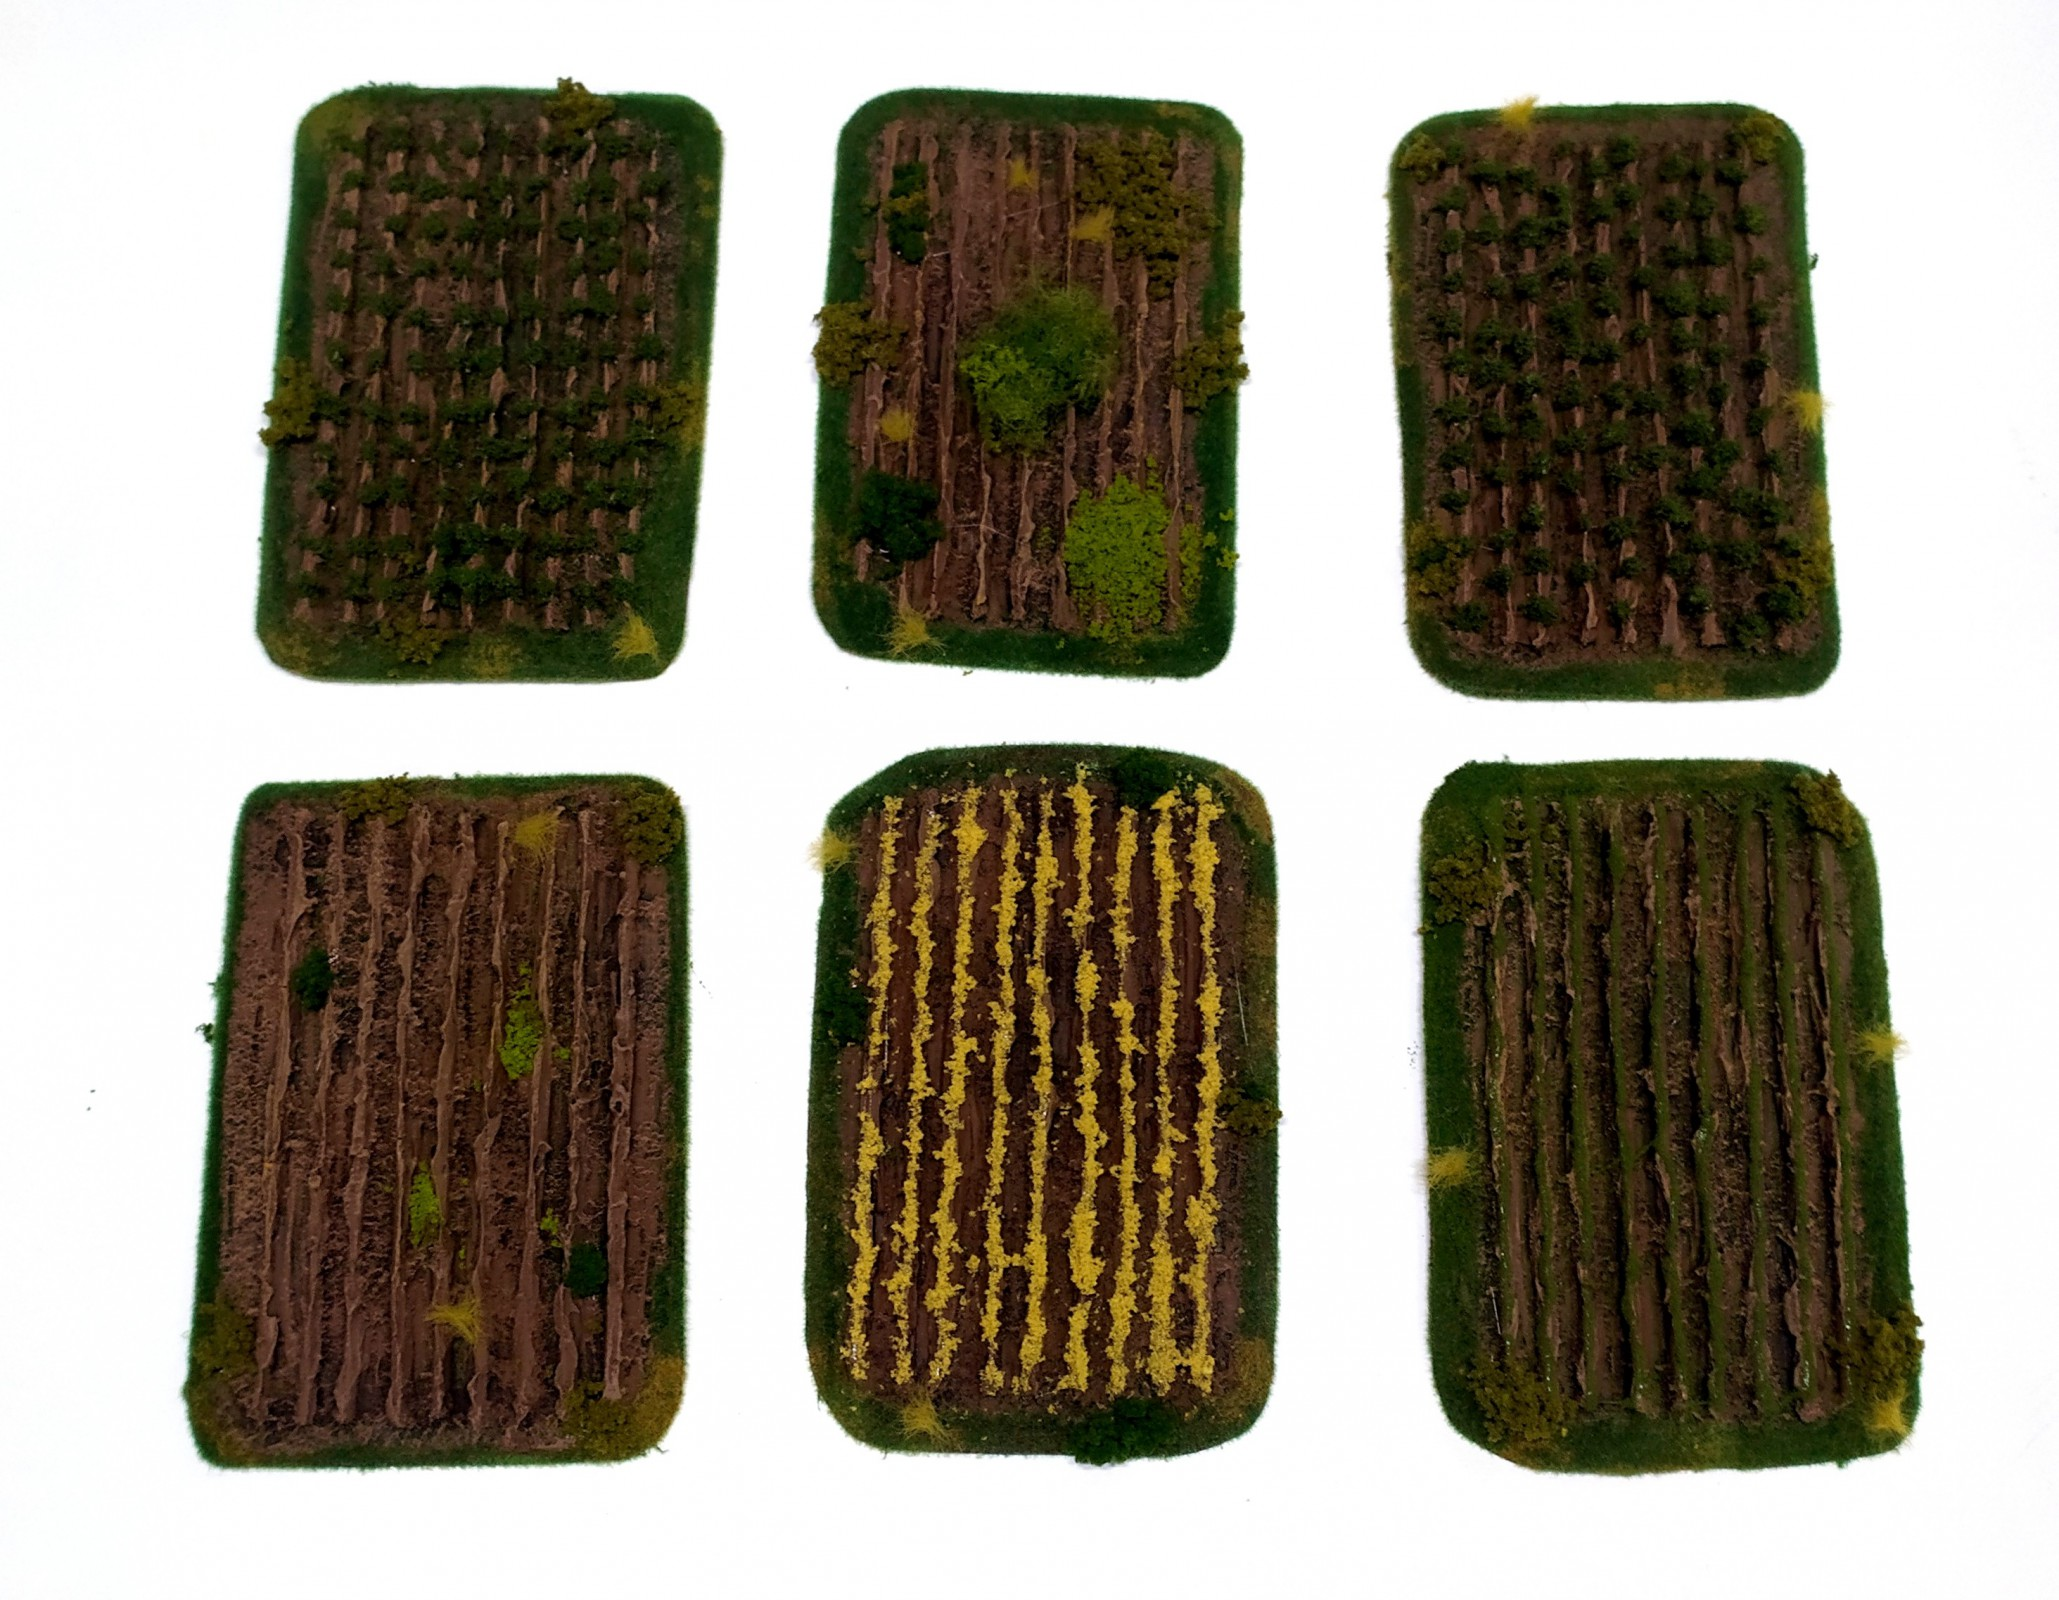 crops-fields-set-6-elements-painted